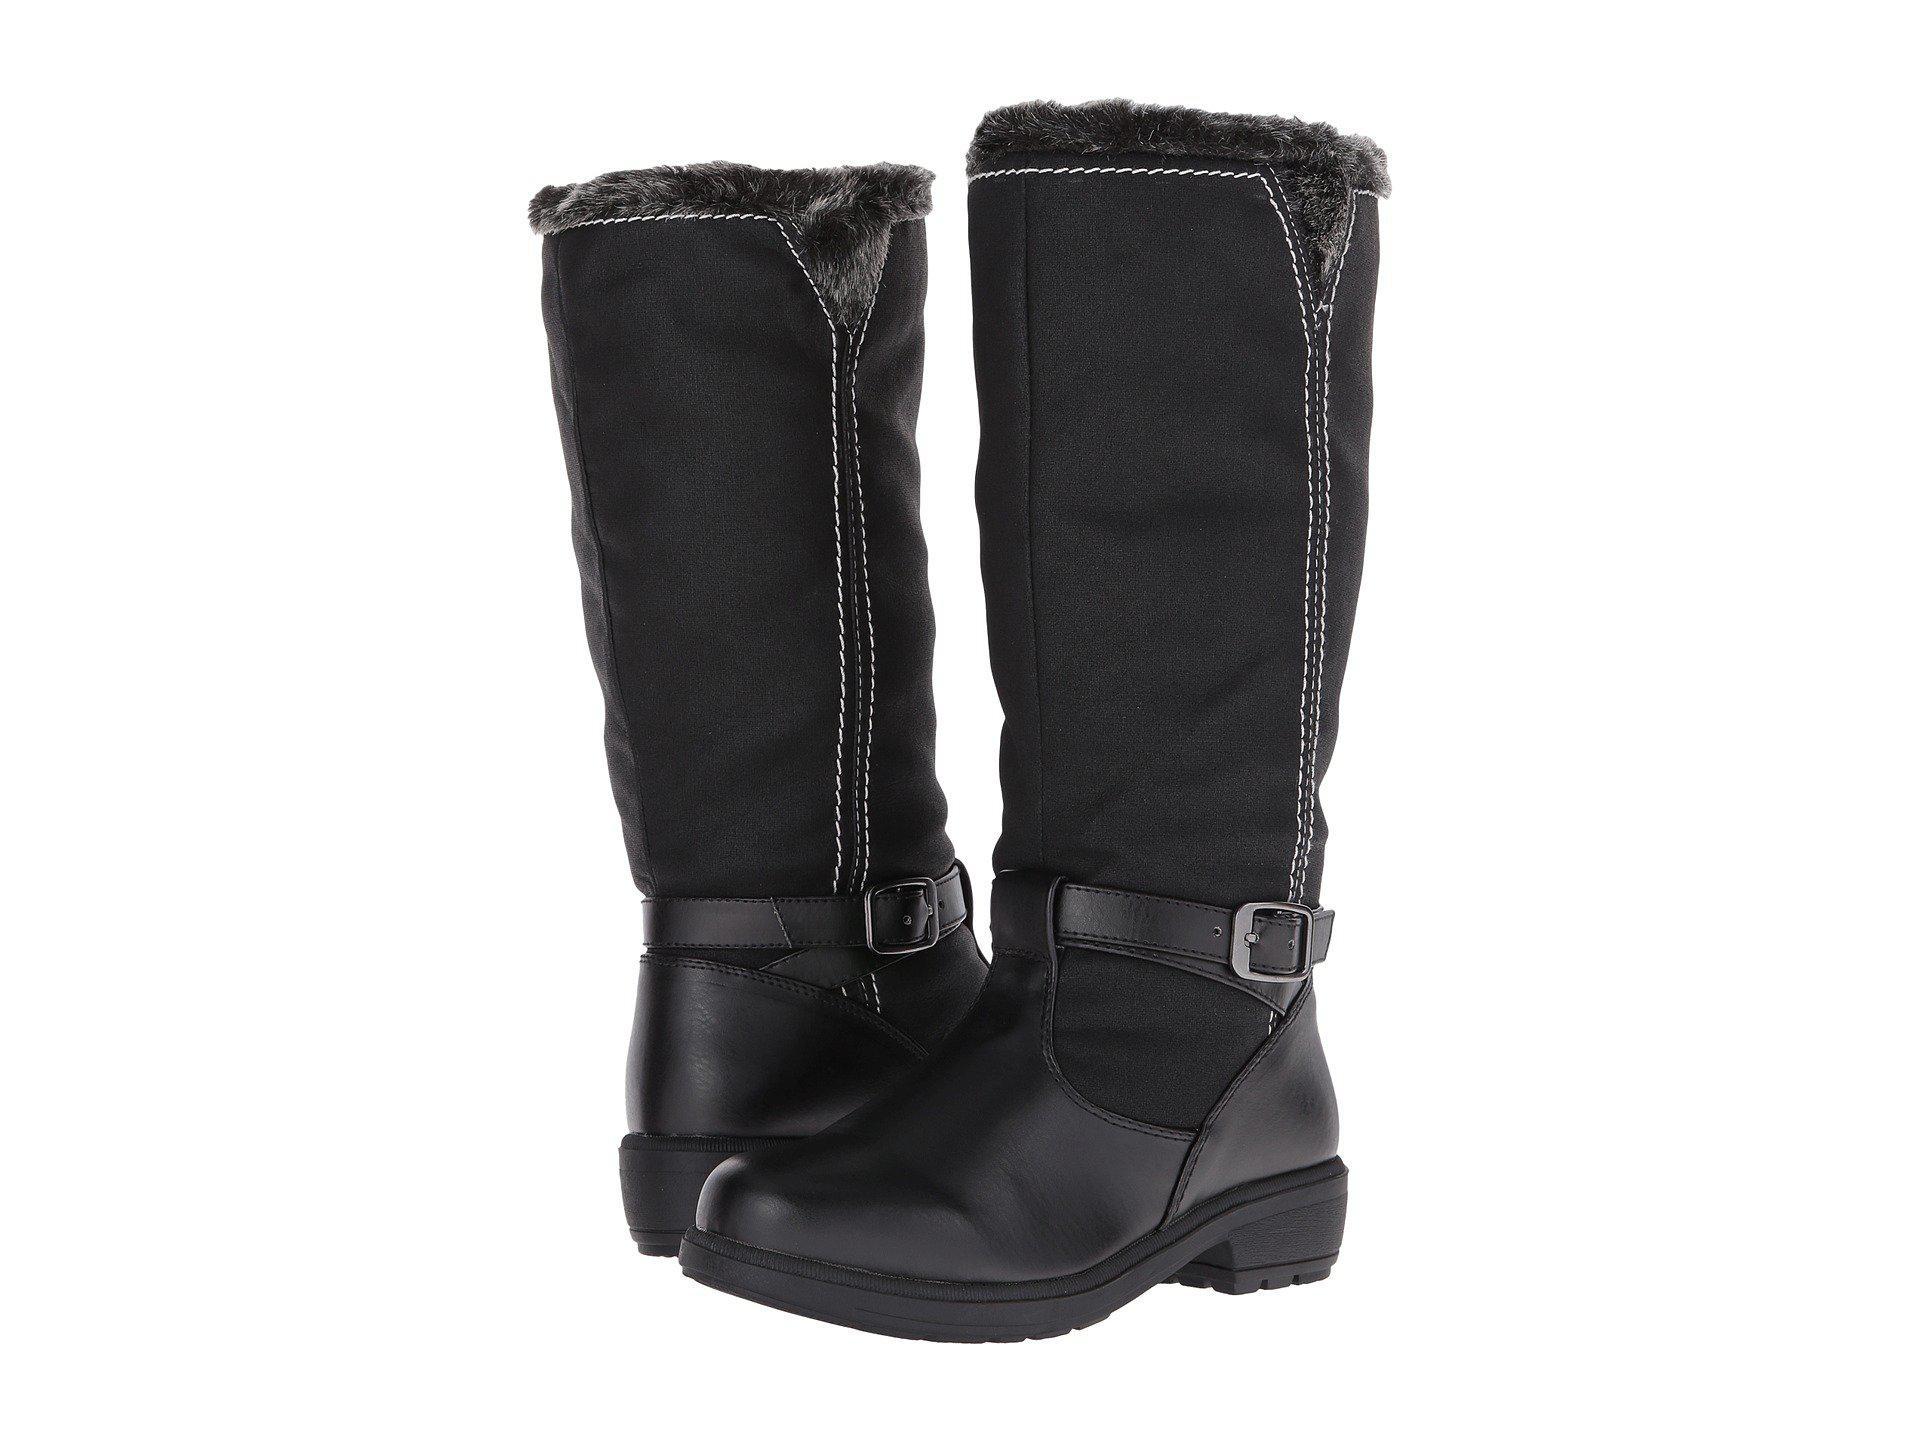 Stylish Women s Boots Tundra Boots Mai Black WomenSpecial buy